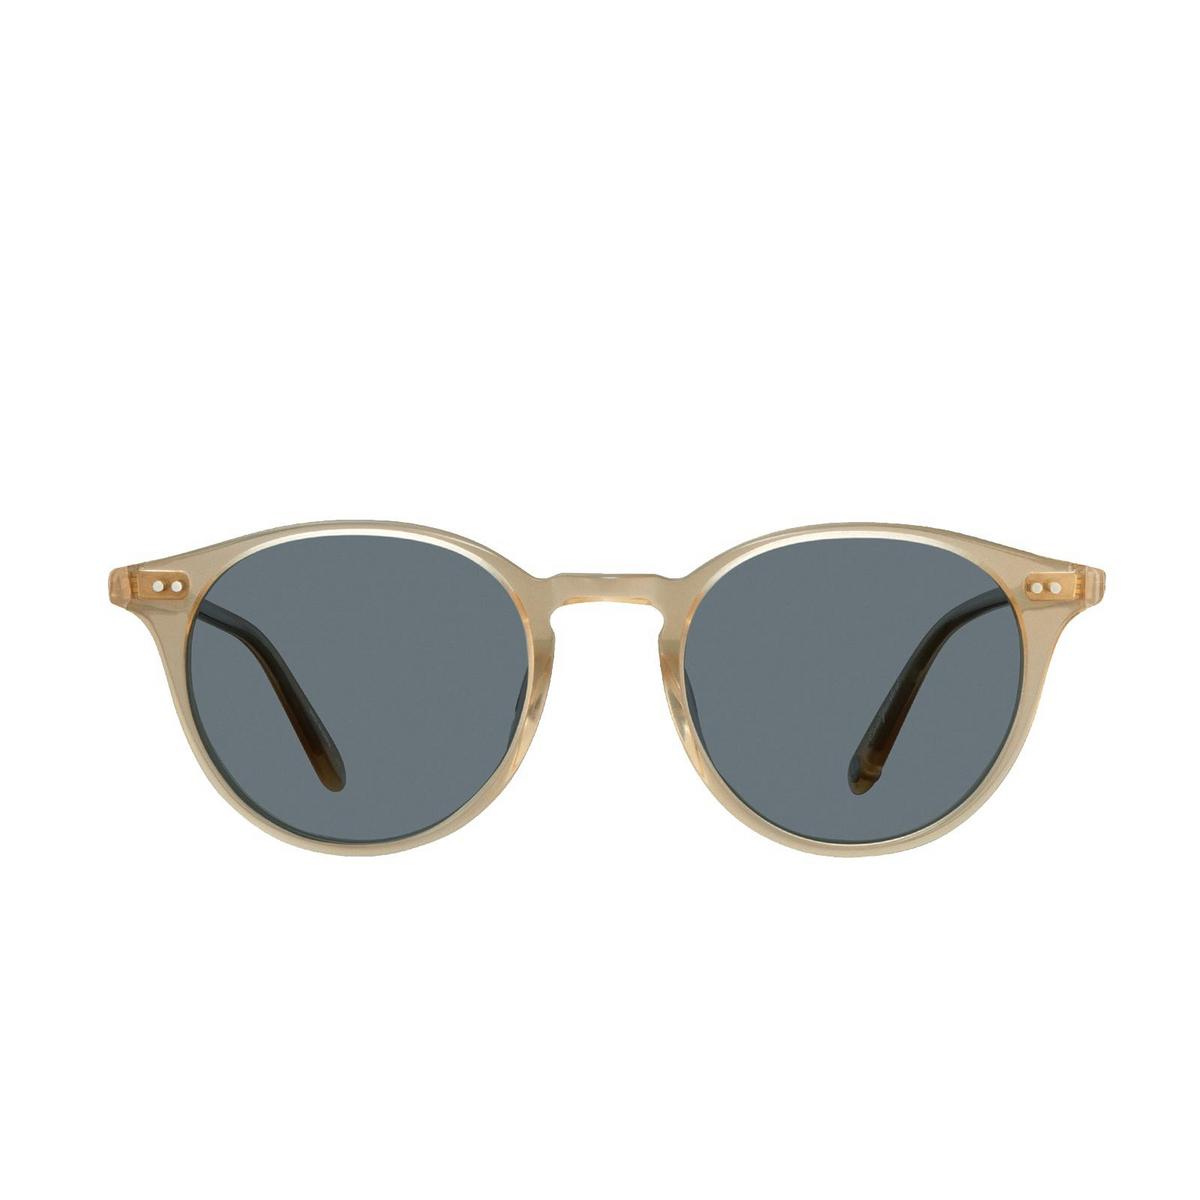 Garrett Leight® Round Sunglasses: Clune Sun color Blonde B-sfbs - 1/2.